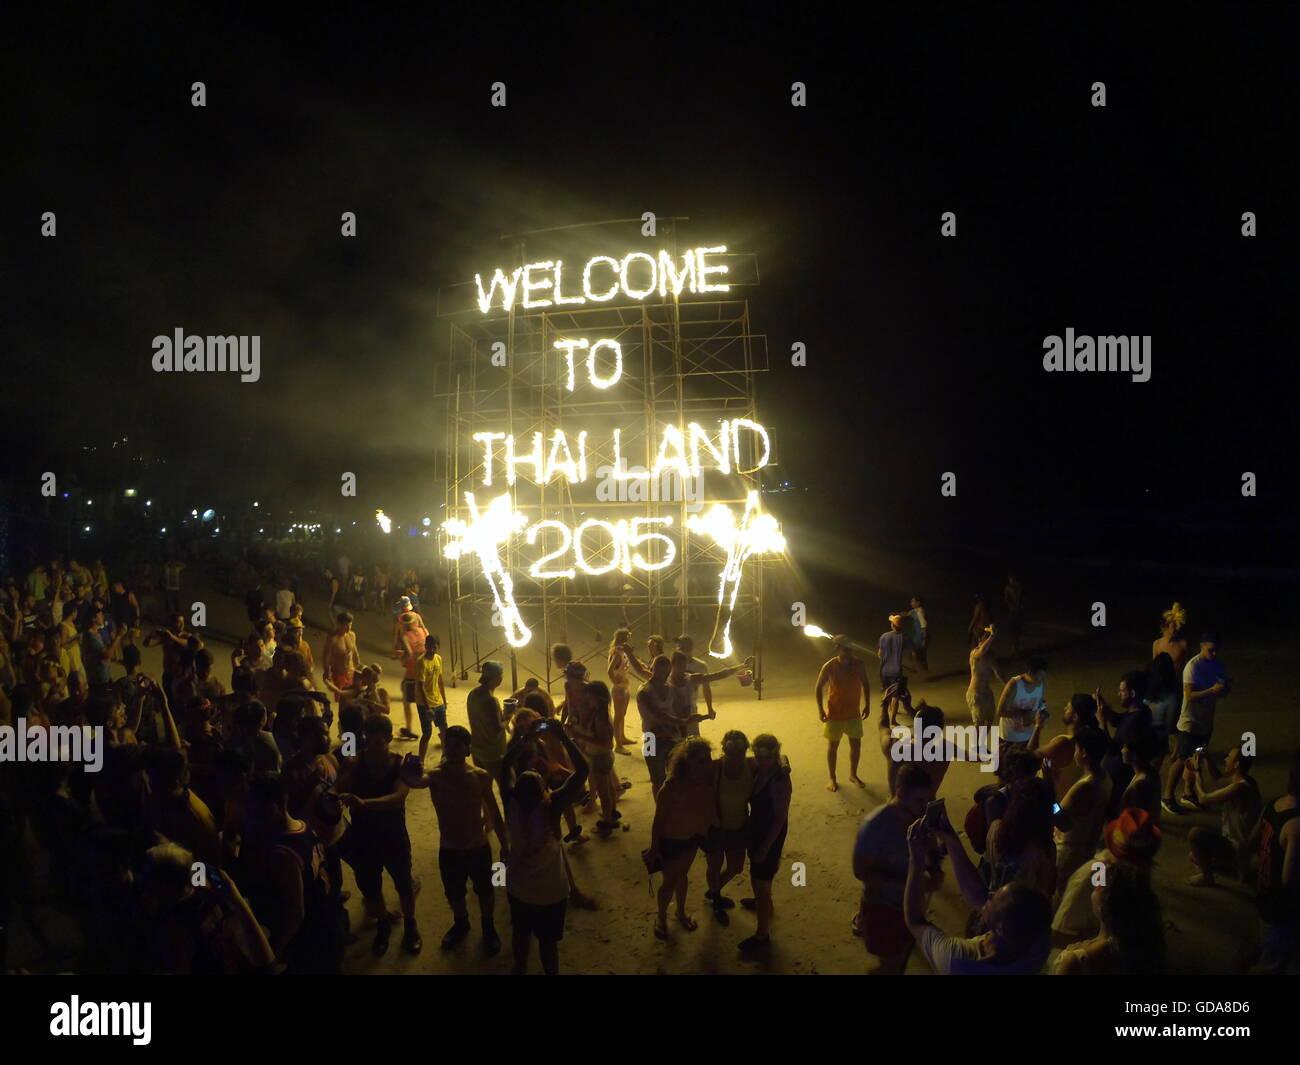 thailand - Stock Image